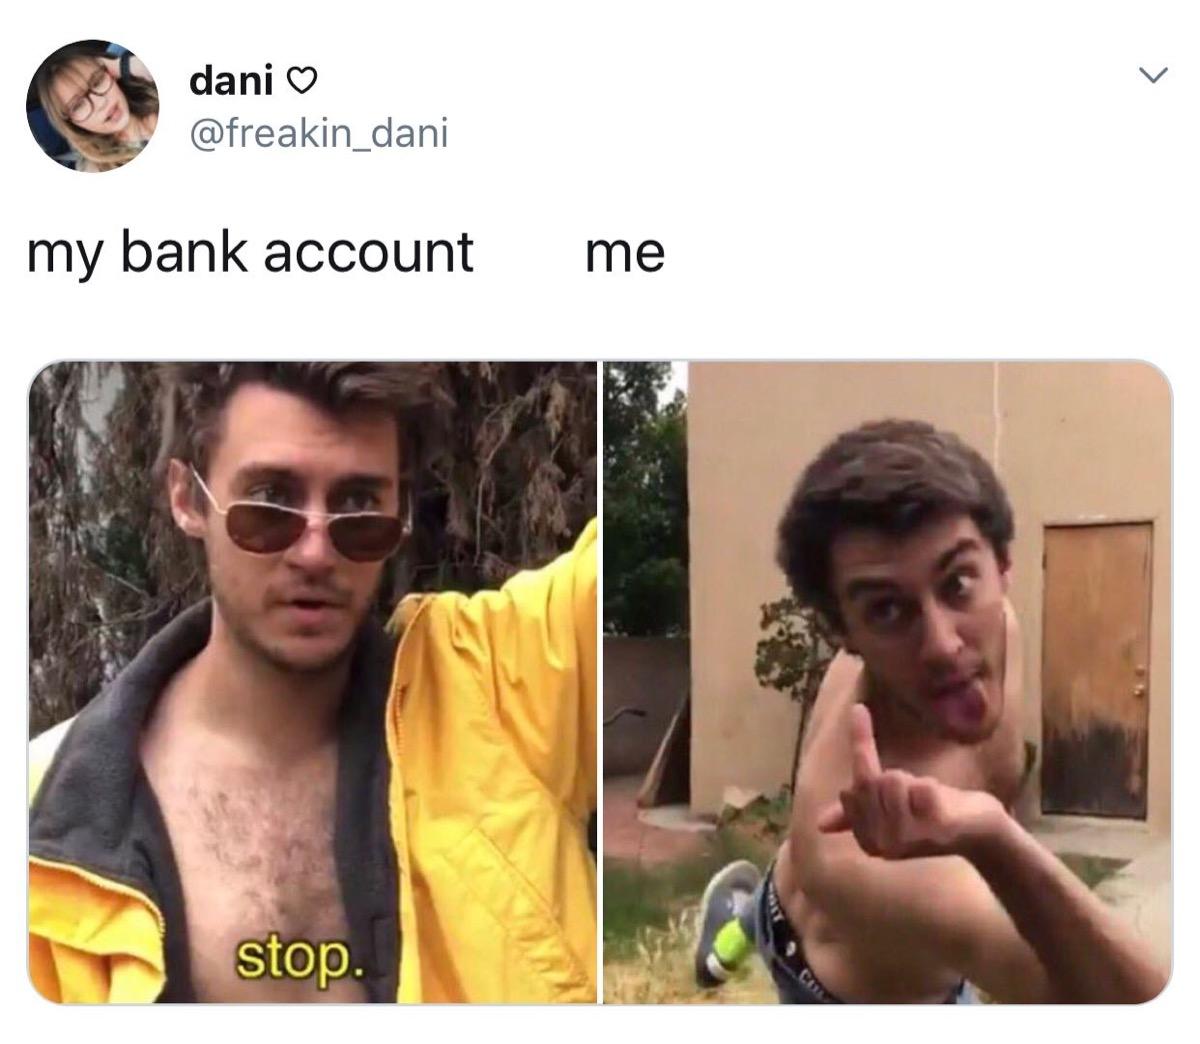 casey frey stop meme, 2019 memes